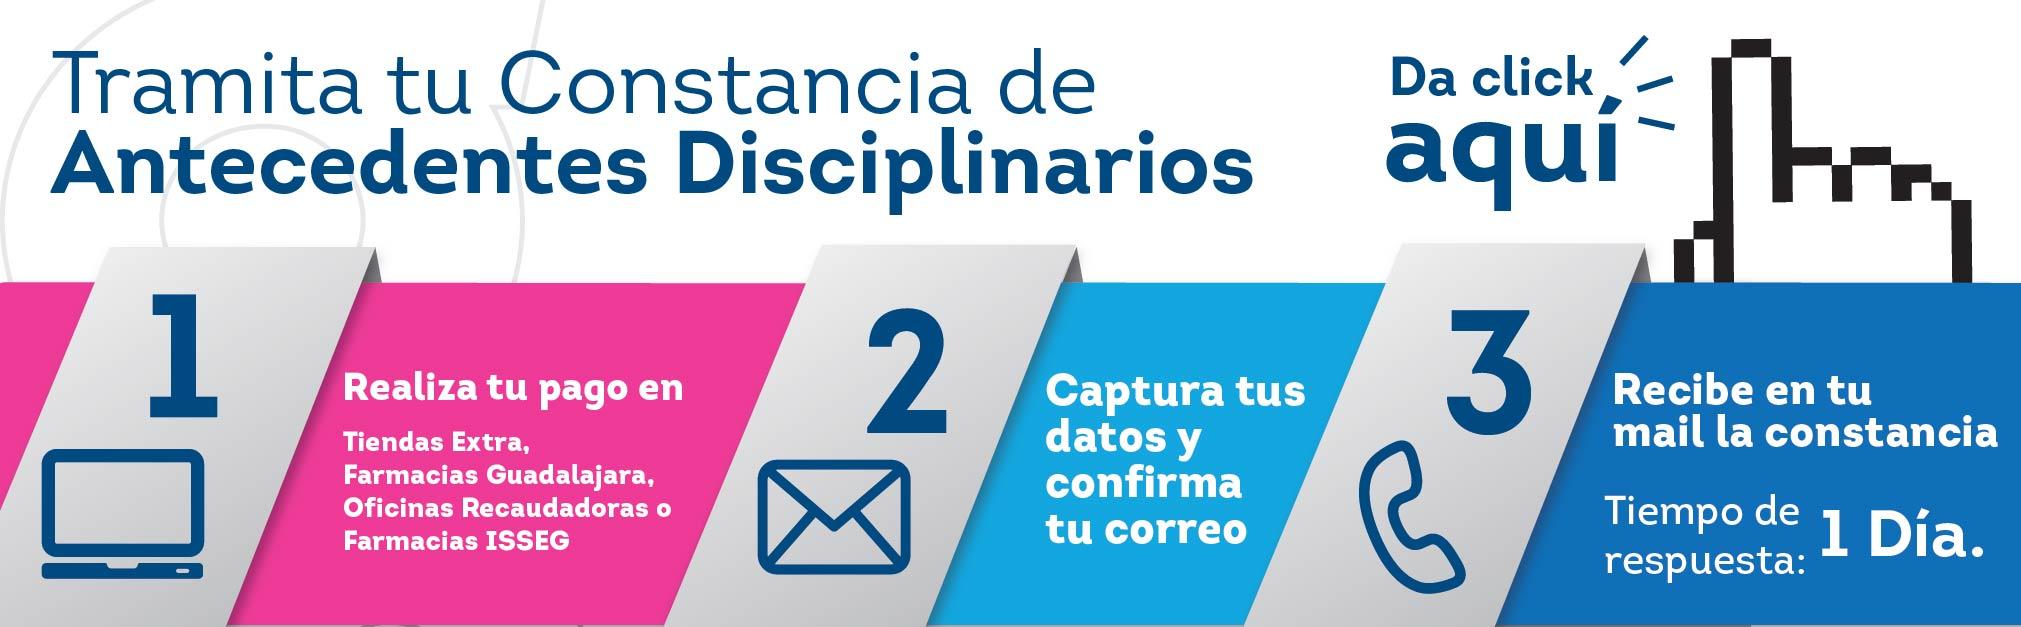 baner TRAMITE DE ANTECEDENTES DISCIPLINARIOS-01